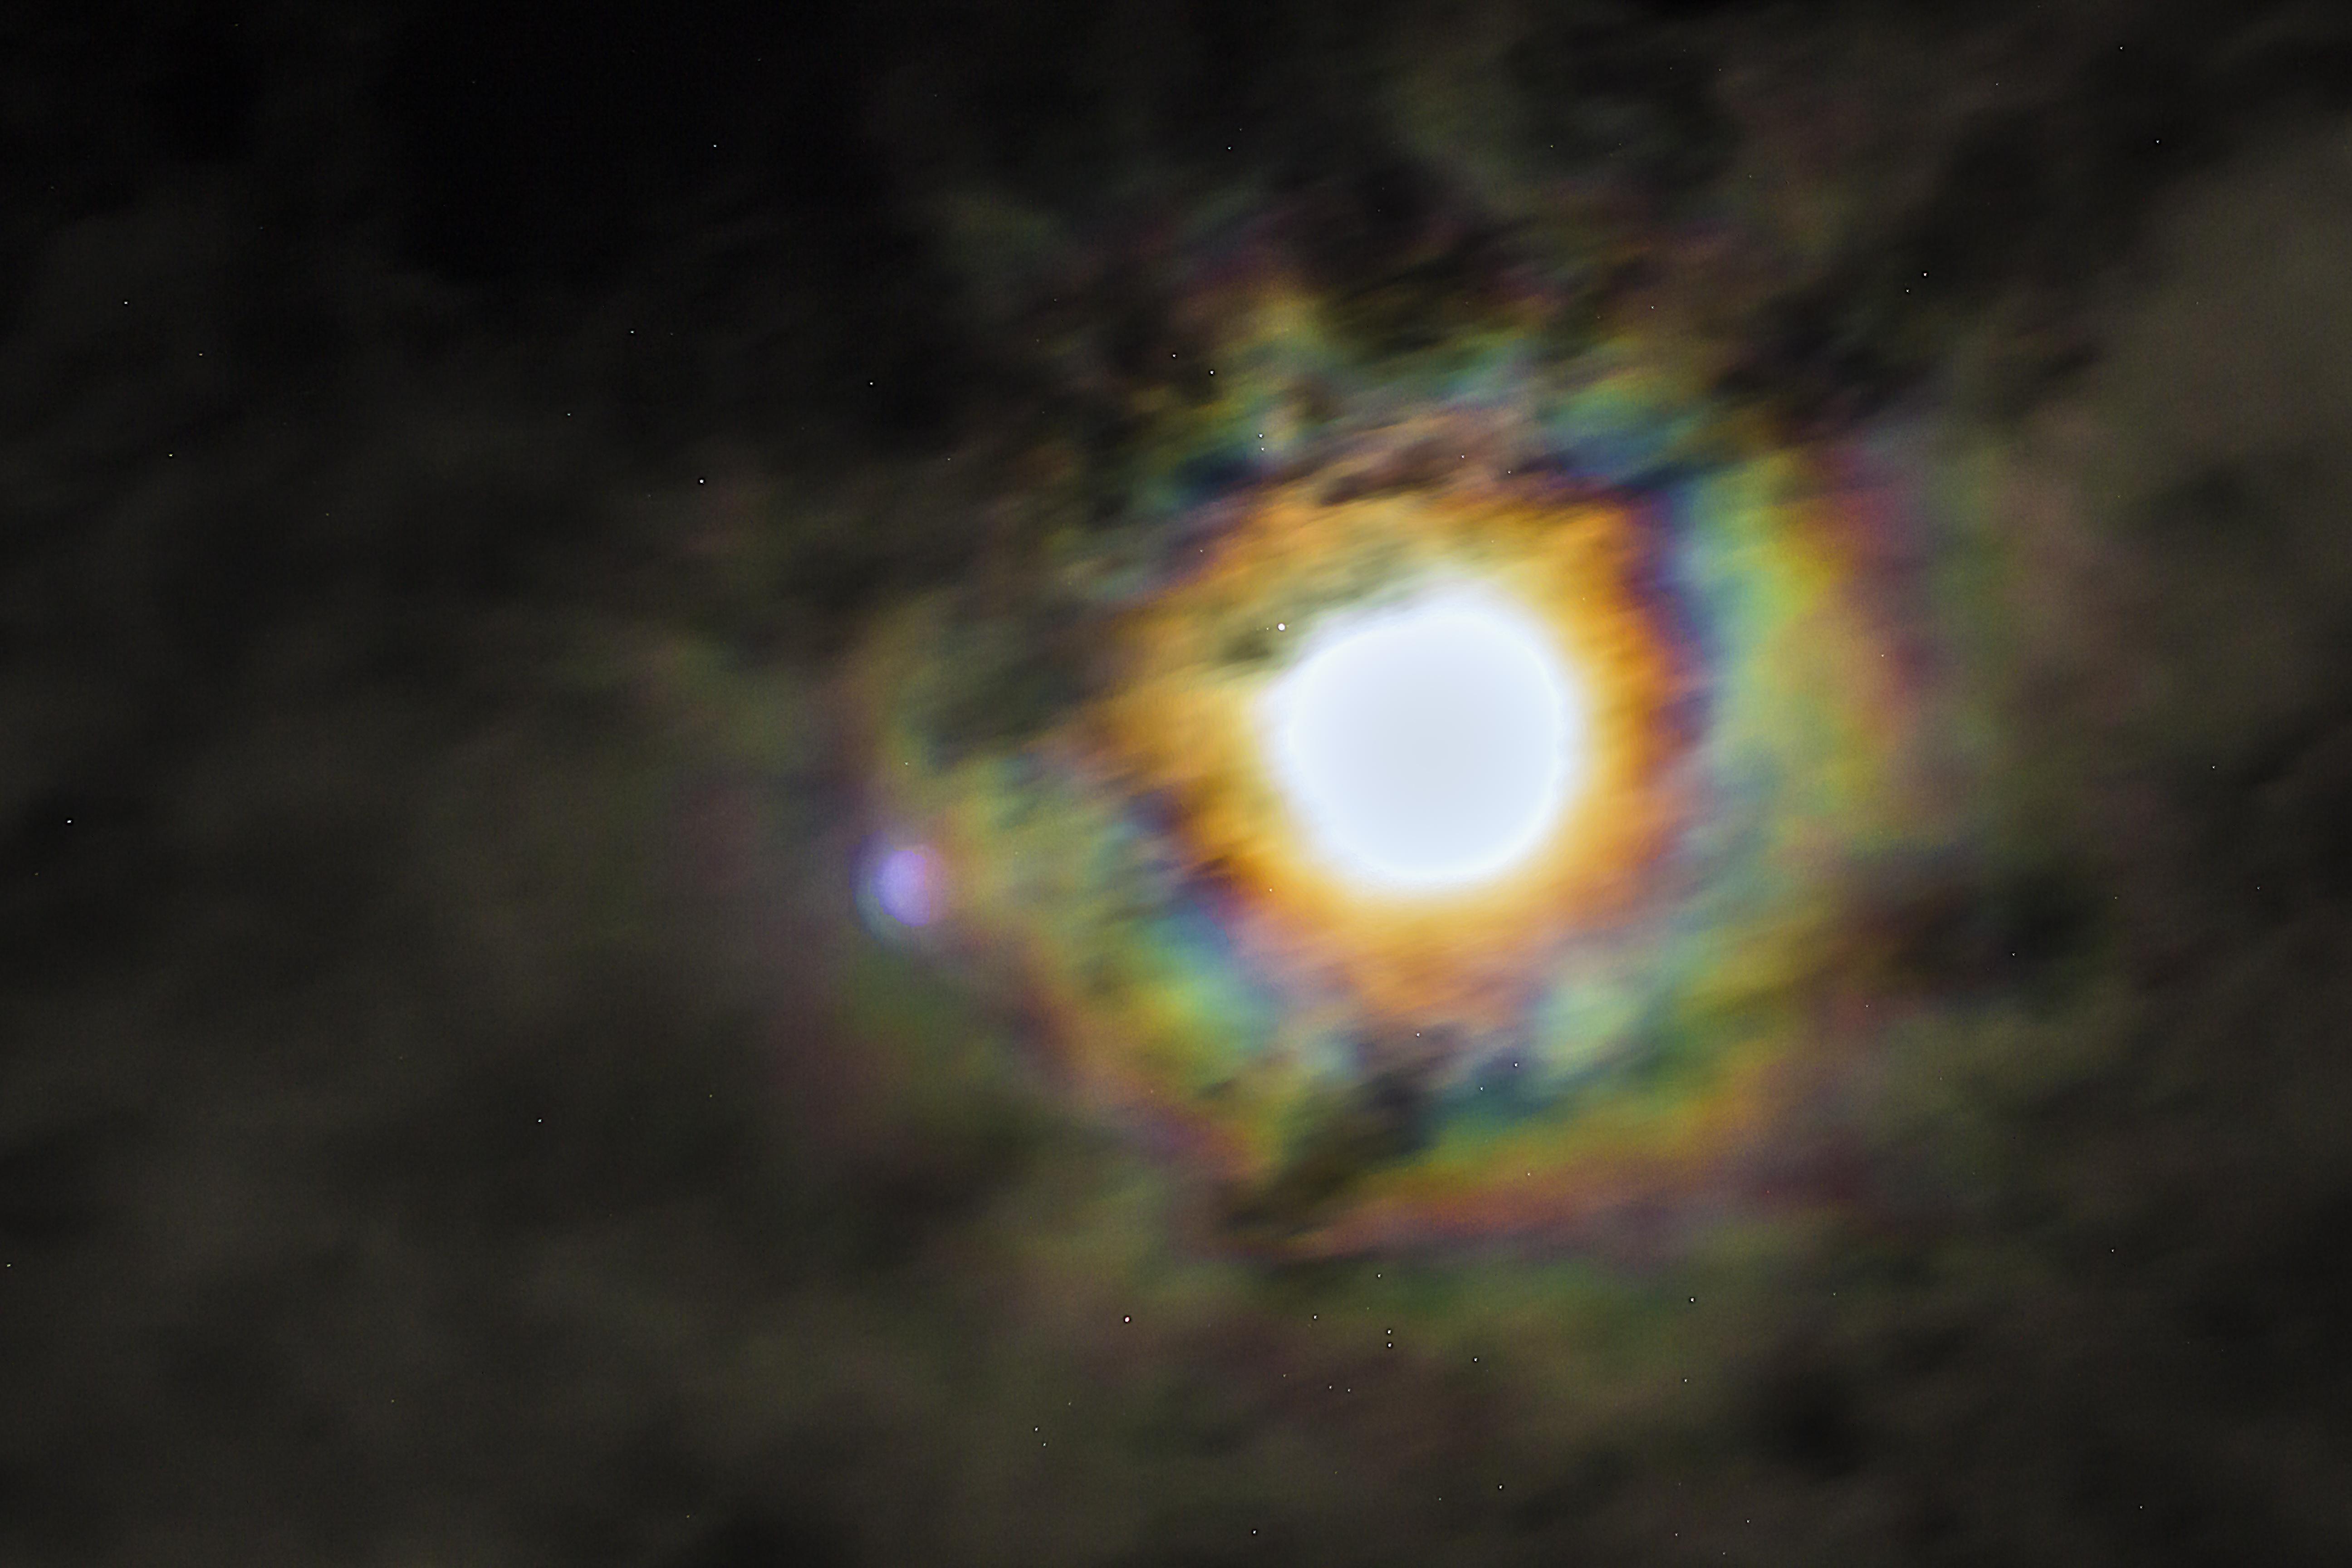 Moon Rainbow Halo by WerdGhana on DeviantArt